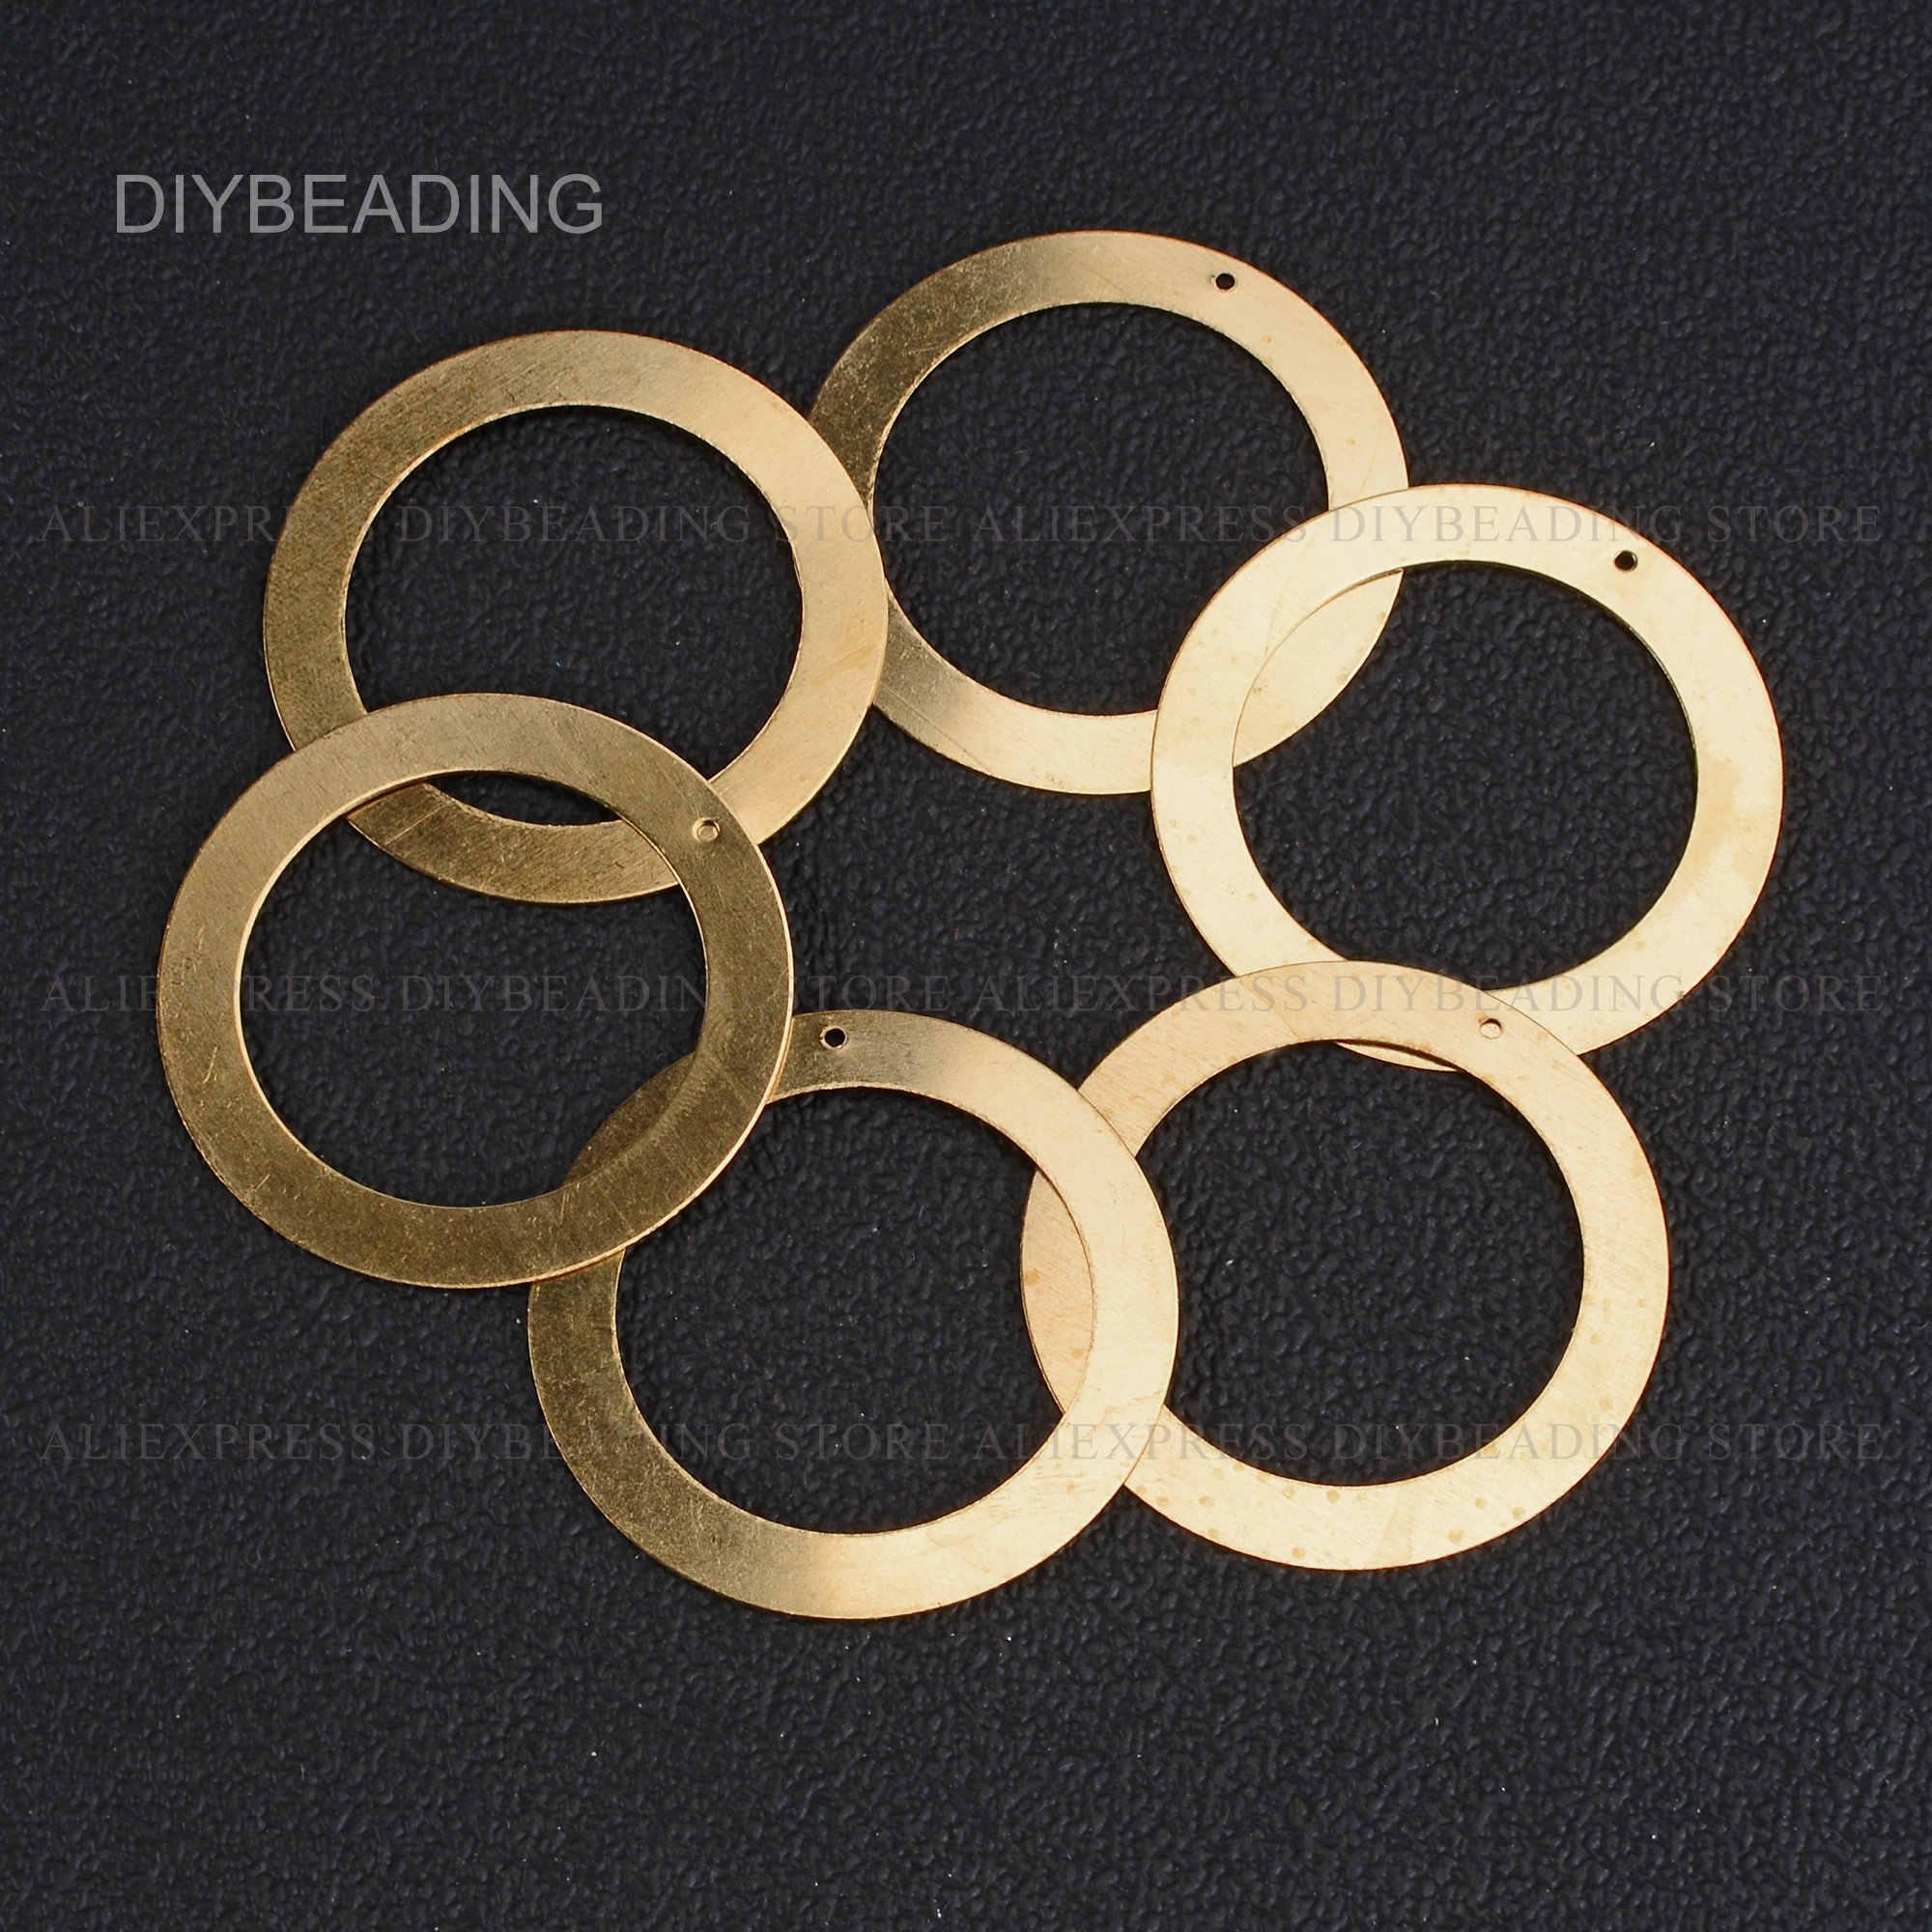 HT967 50pcs 15.4x9.88x1.95mm  Raw Brass Circle Charms,Wave Ring Pendant Geometric Charms,Brass Geometric Blank,DIY Jewelry Finding